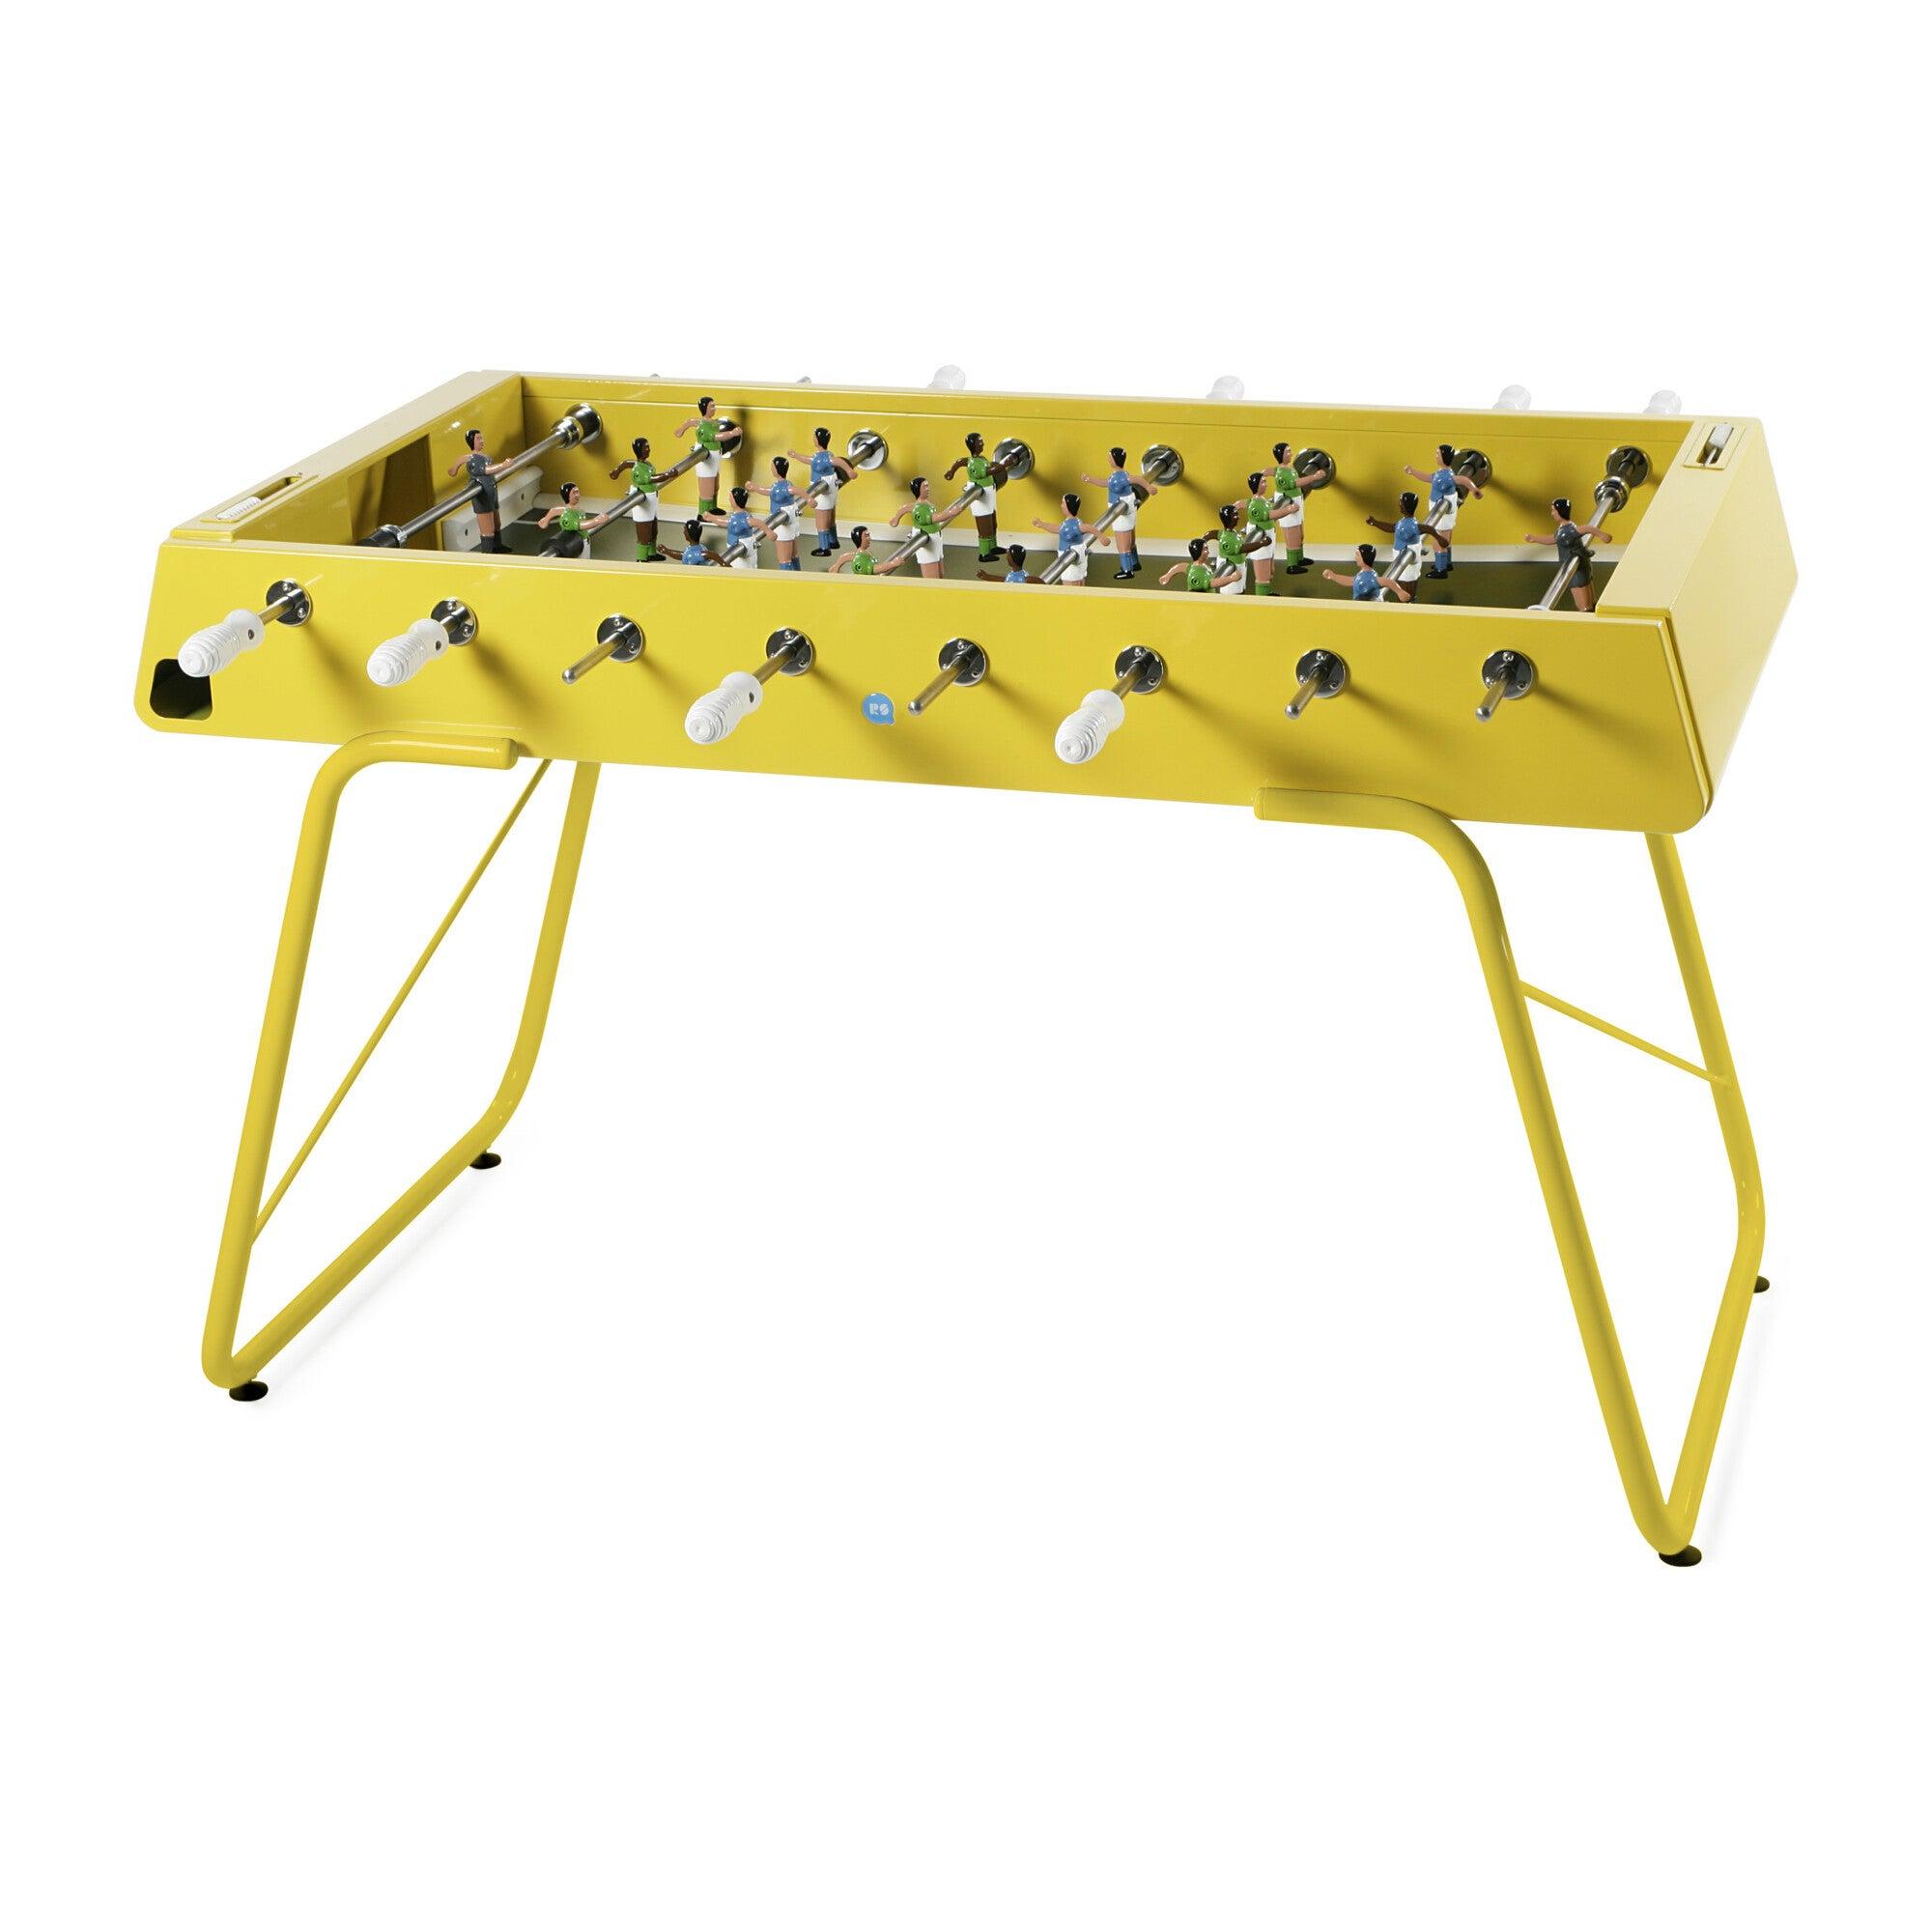 RS #3 Foosball Table, Yellow